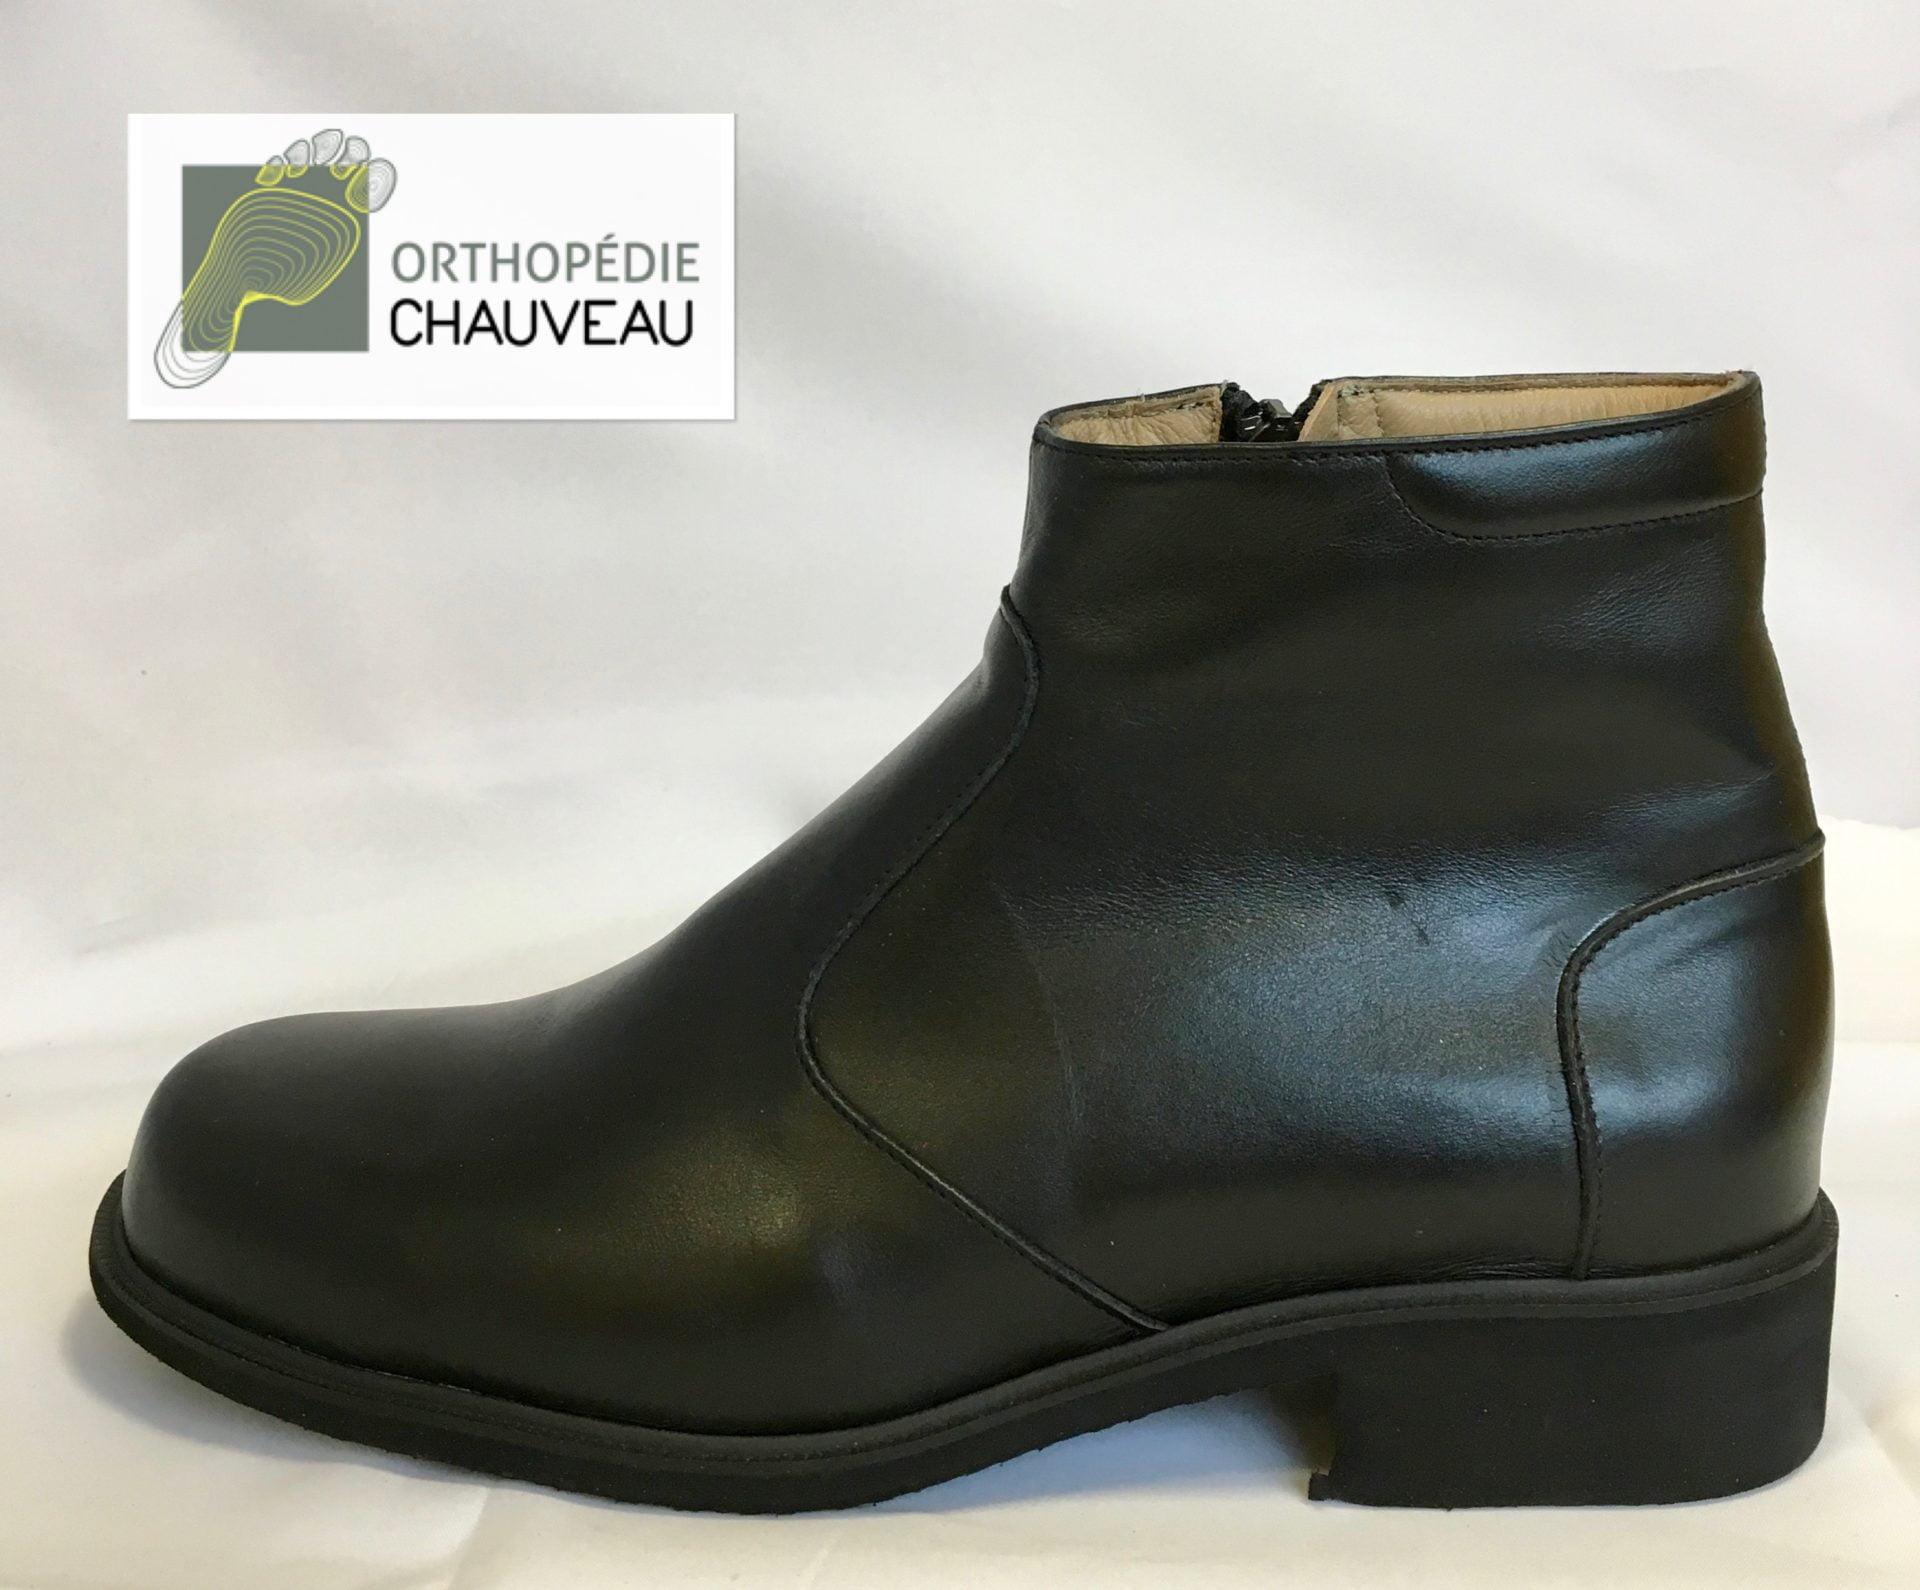 chaussures orthopediques Rennes noir cuir